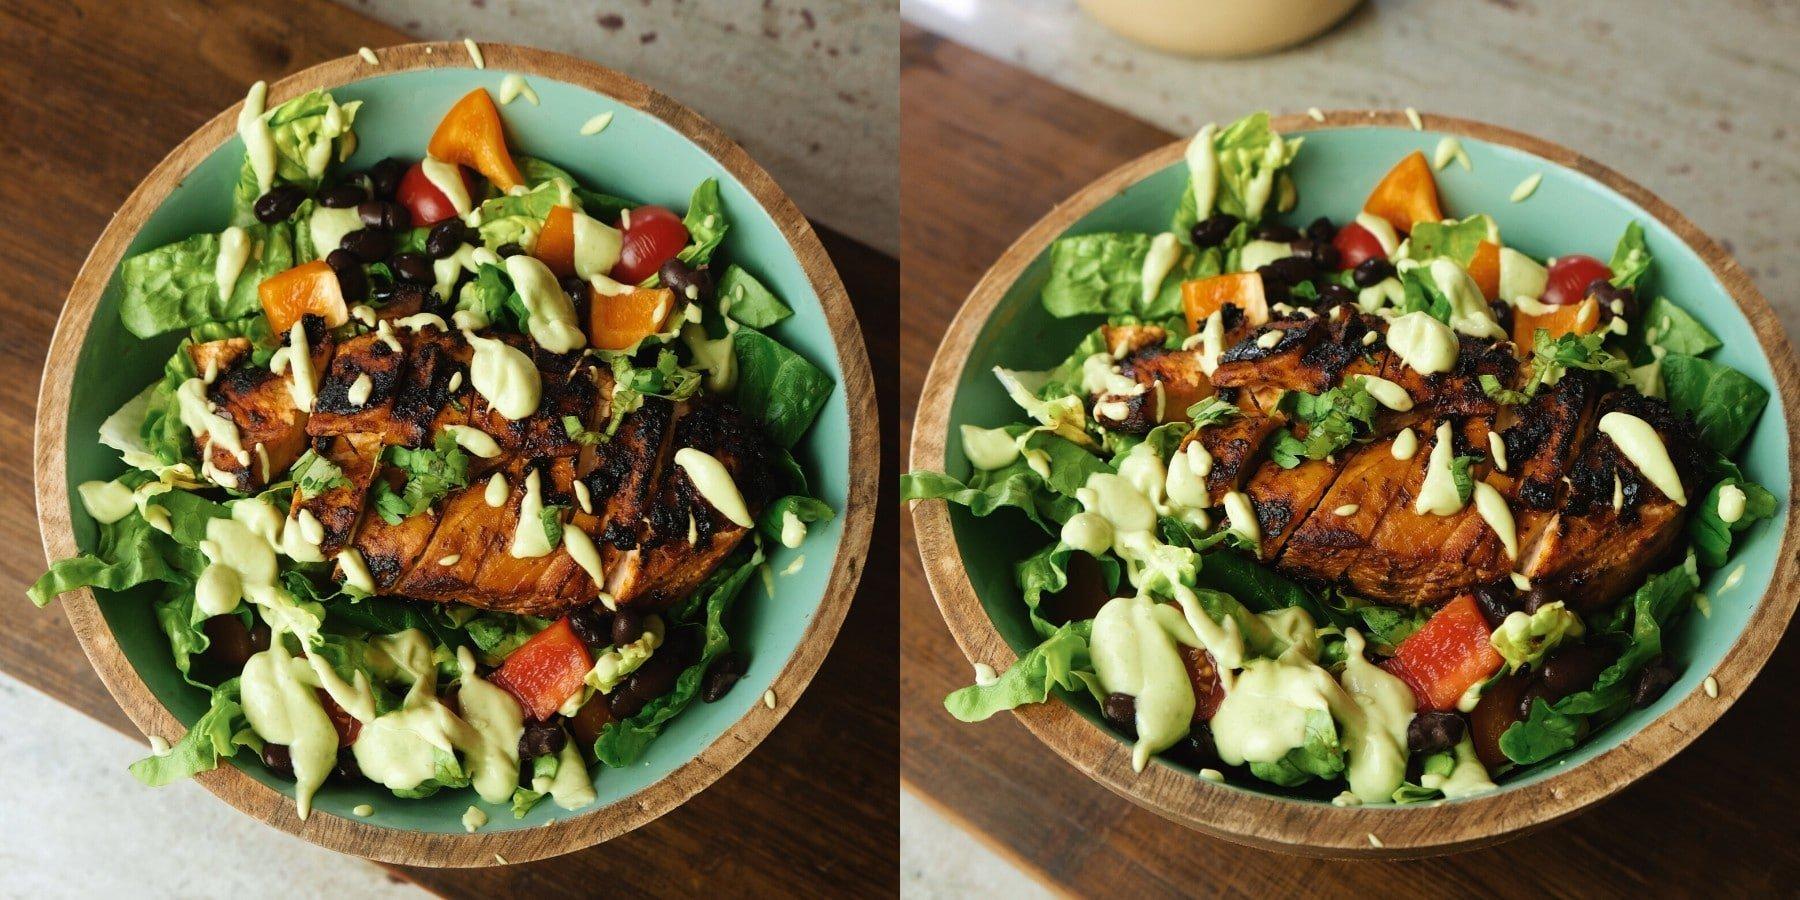 Chipotle Hähnchensalat | Sommer Meal Prep